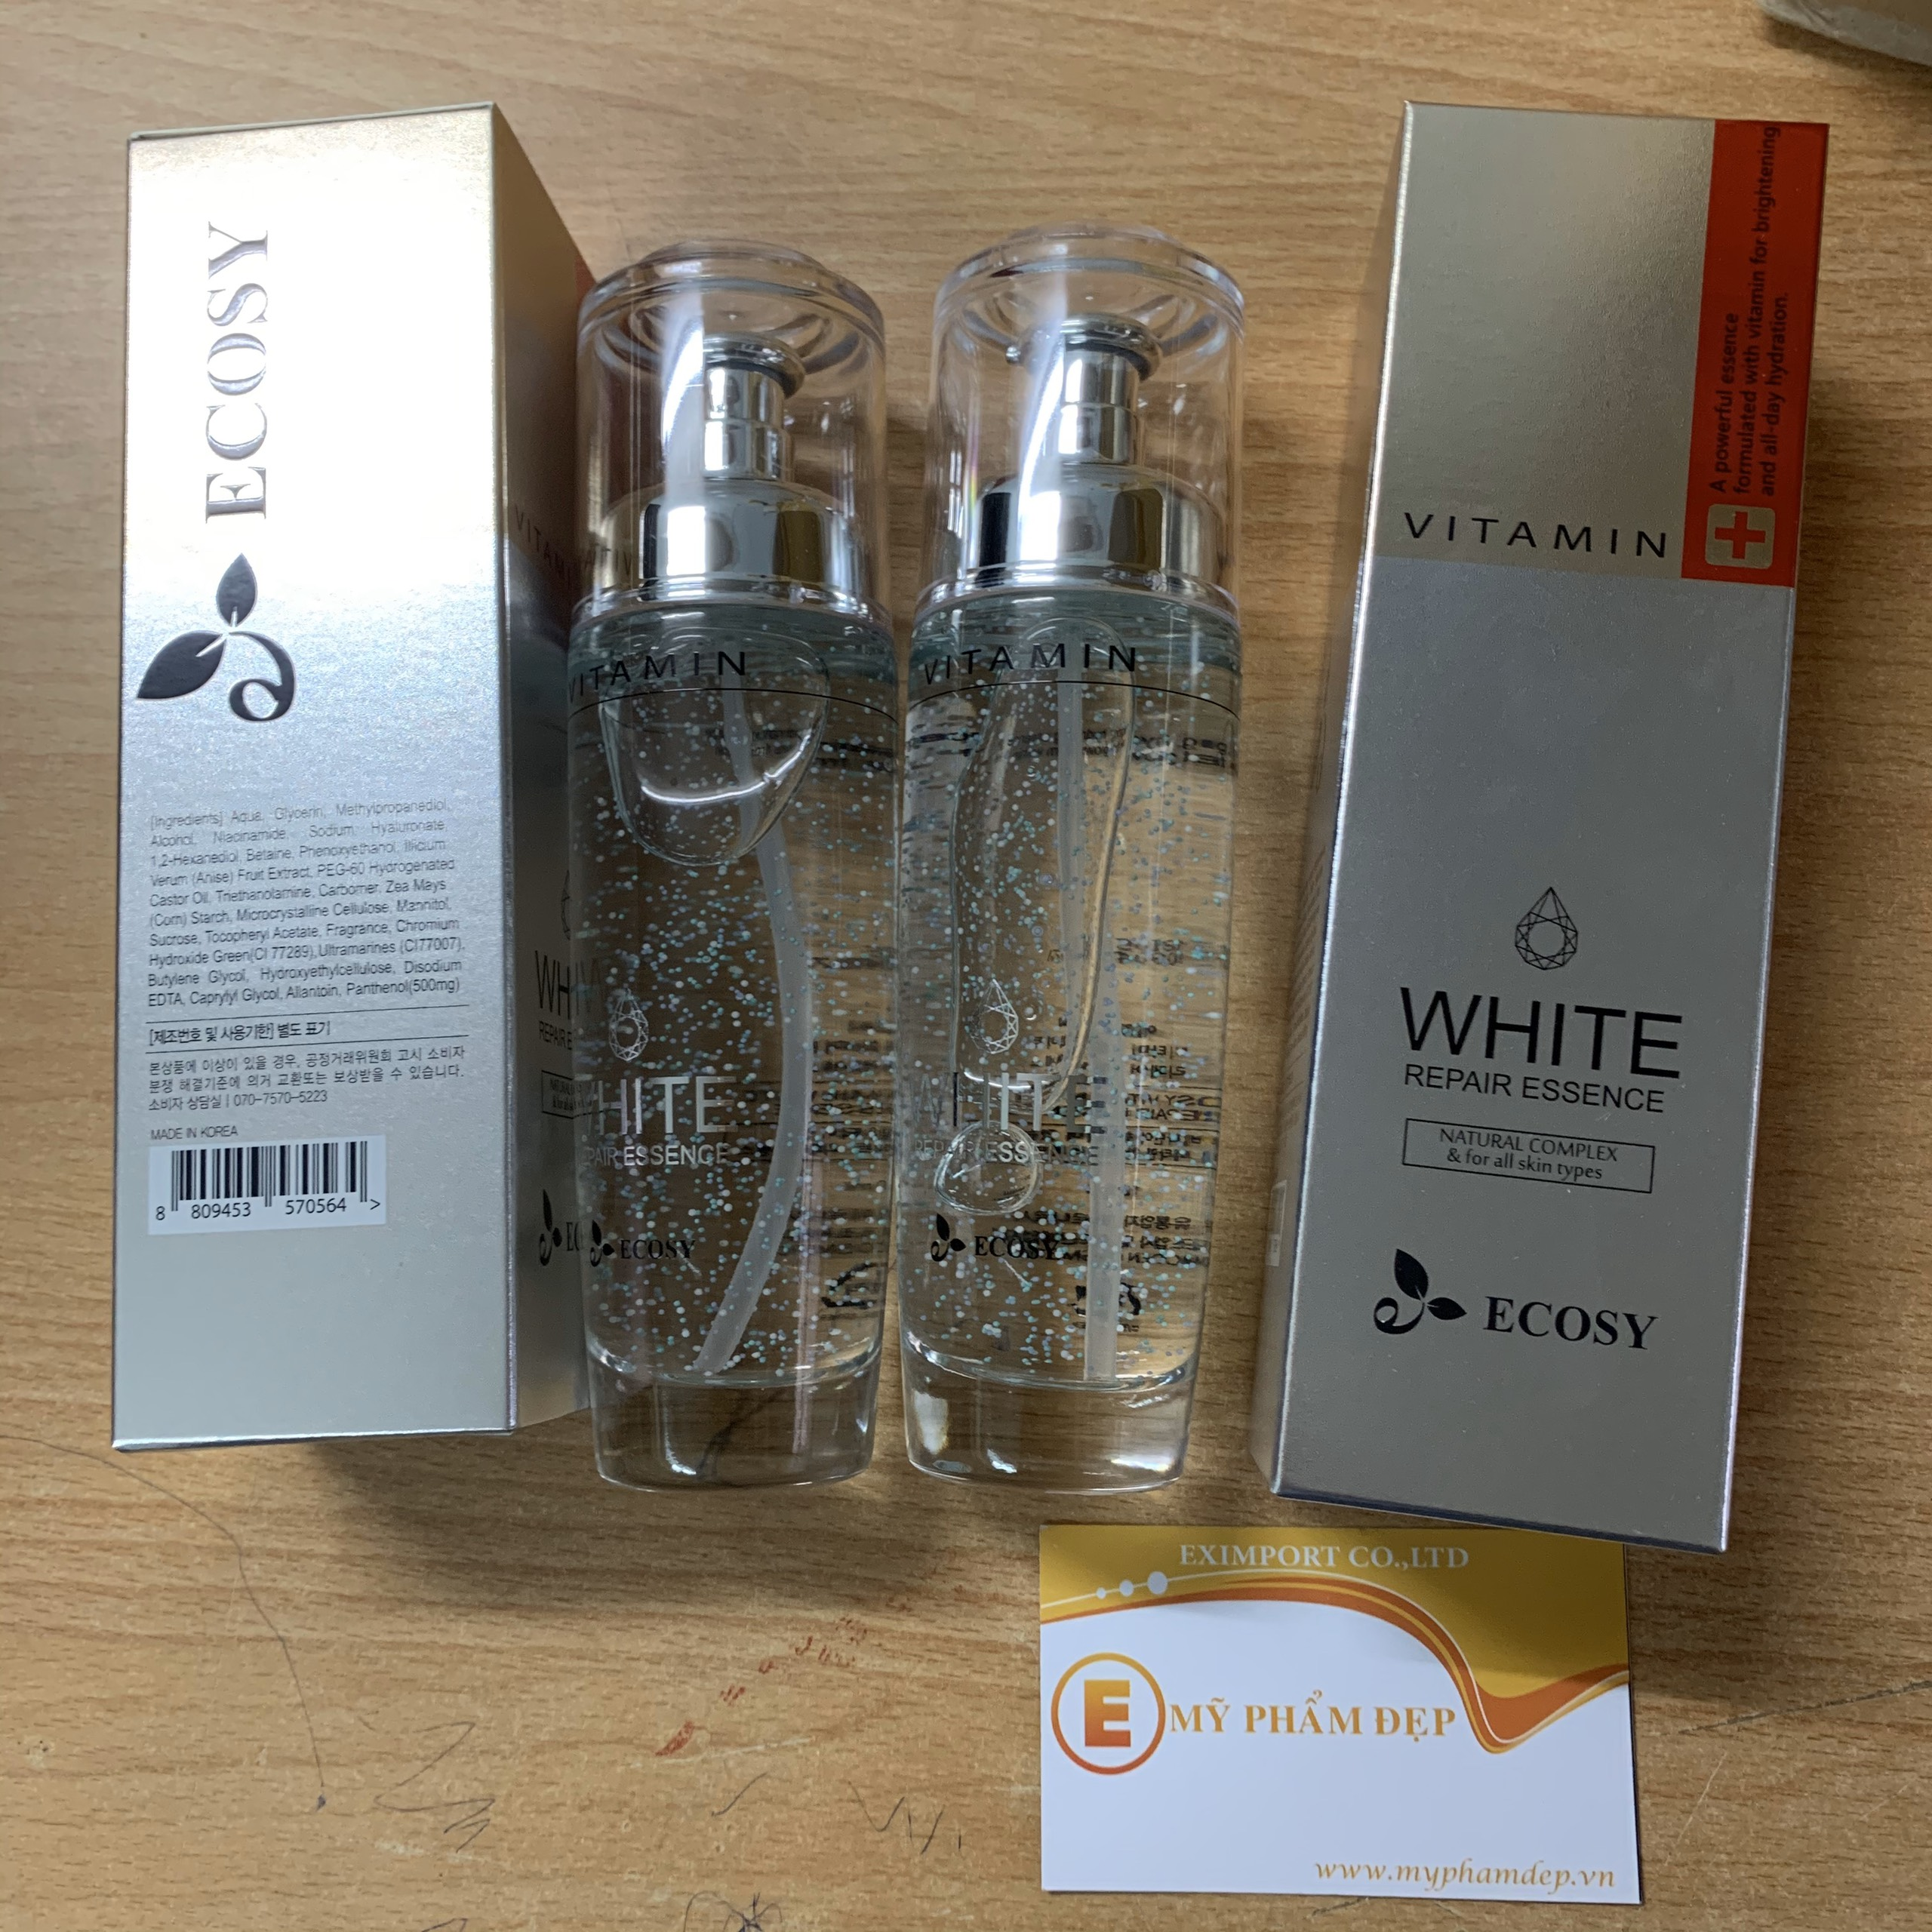 kem-duong-trang-da-tinh-chat-trang-da-vitamin-white-repair-essence-ecosy-120ml-2642